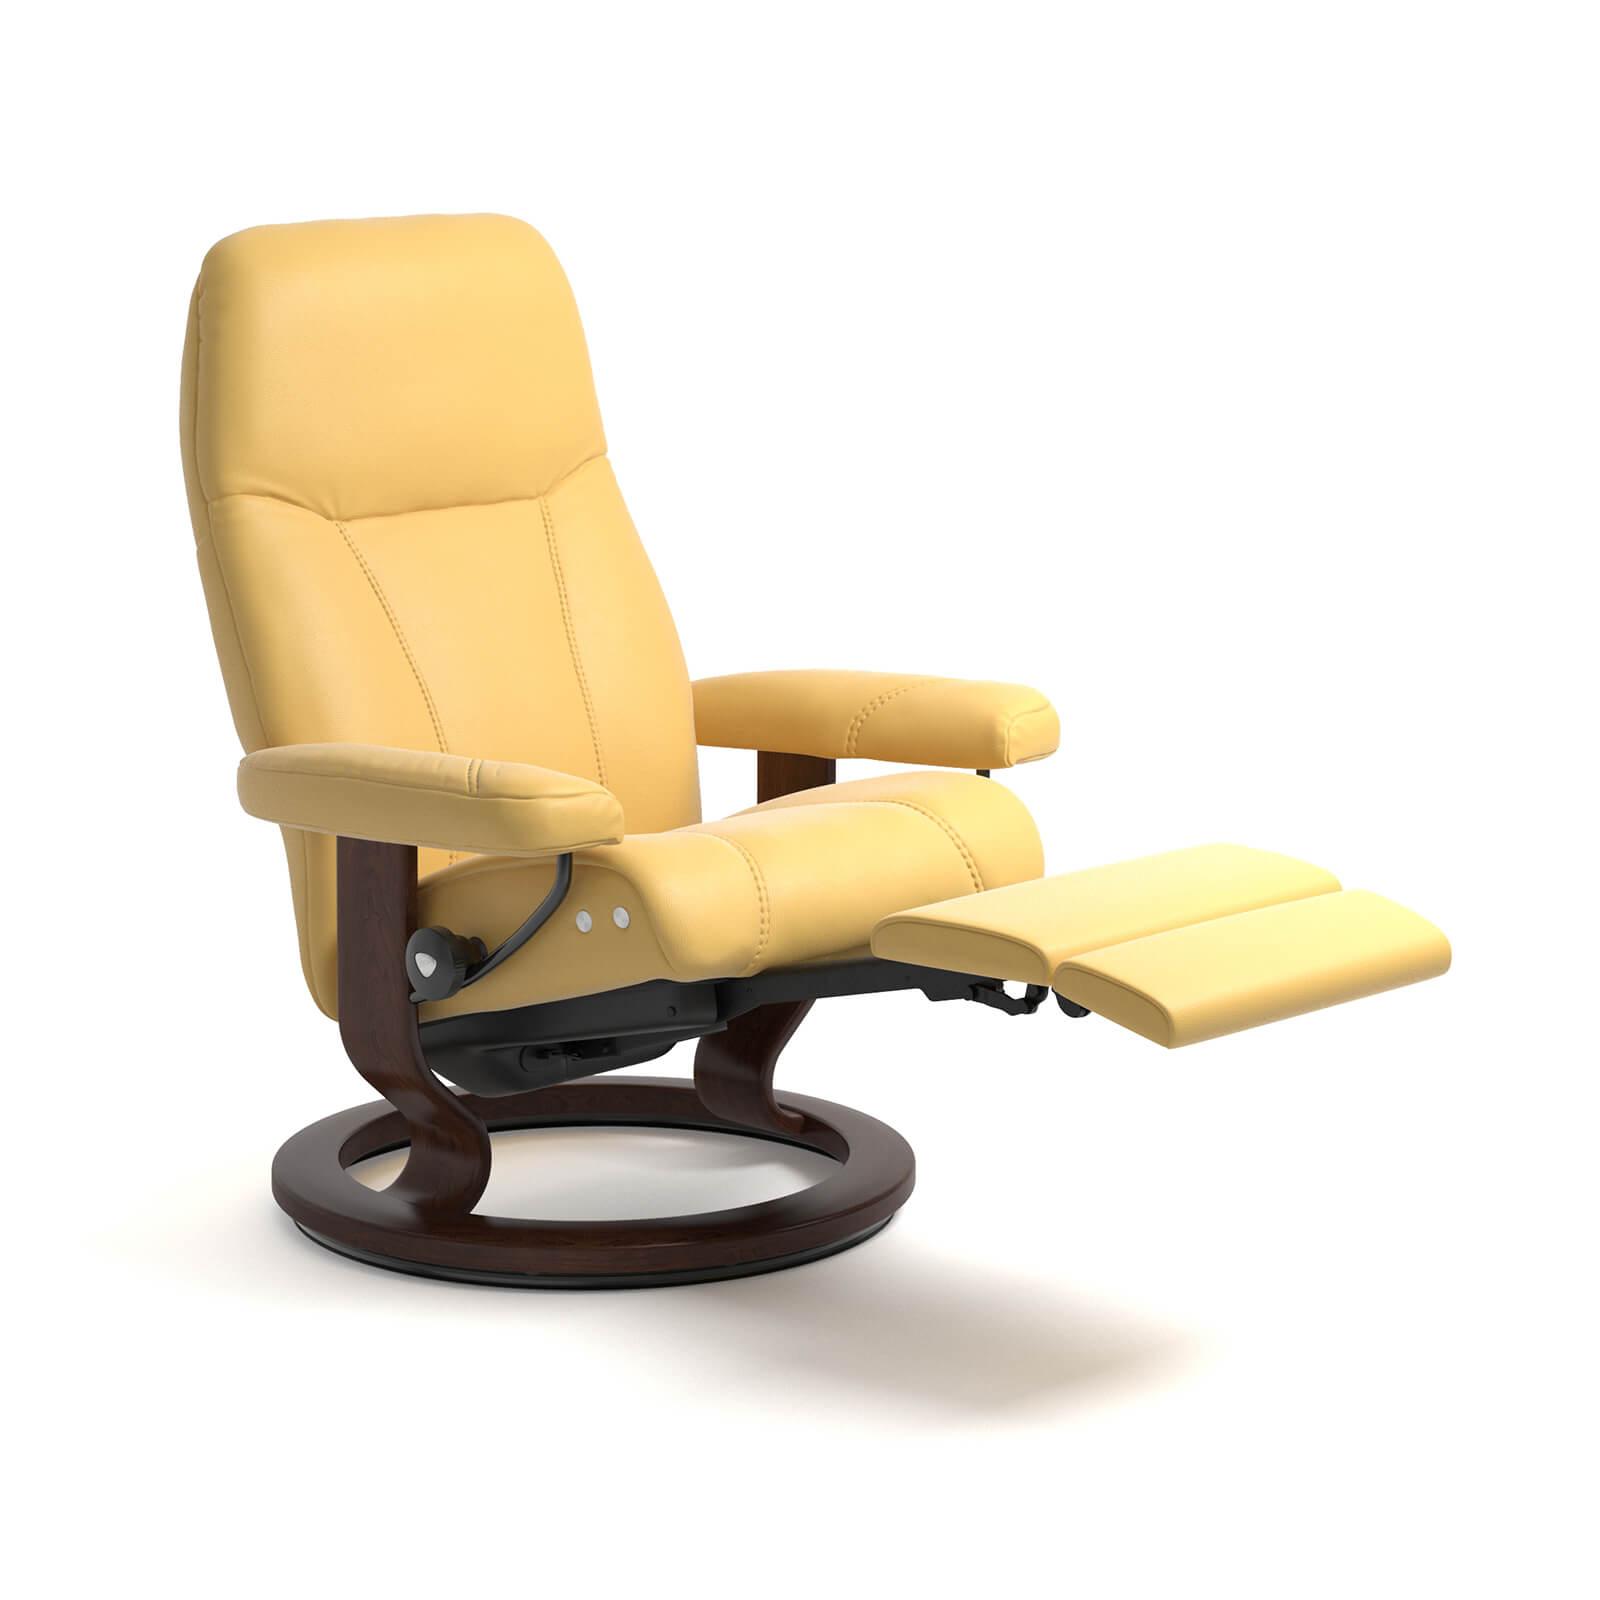 stressless reaxsessel consul legcomfort batick mimosa. Black Bedroom Furniture Sets. Home Design Ideas